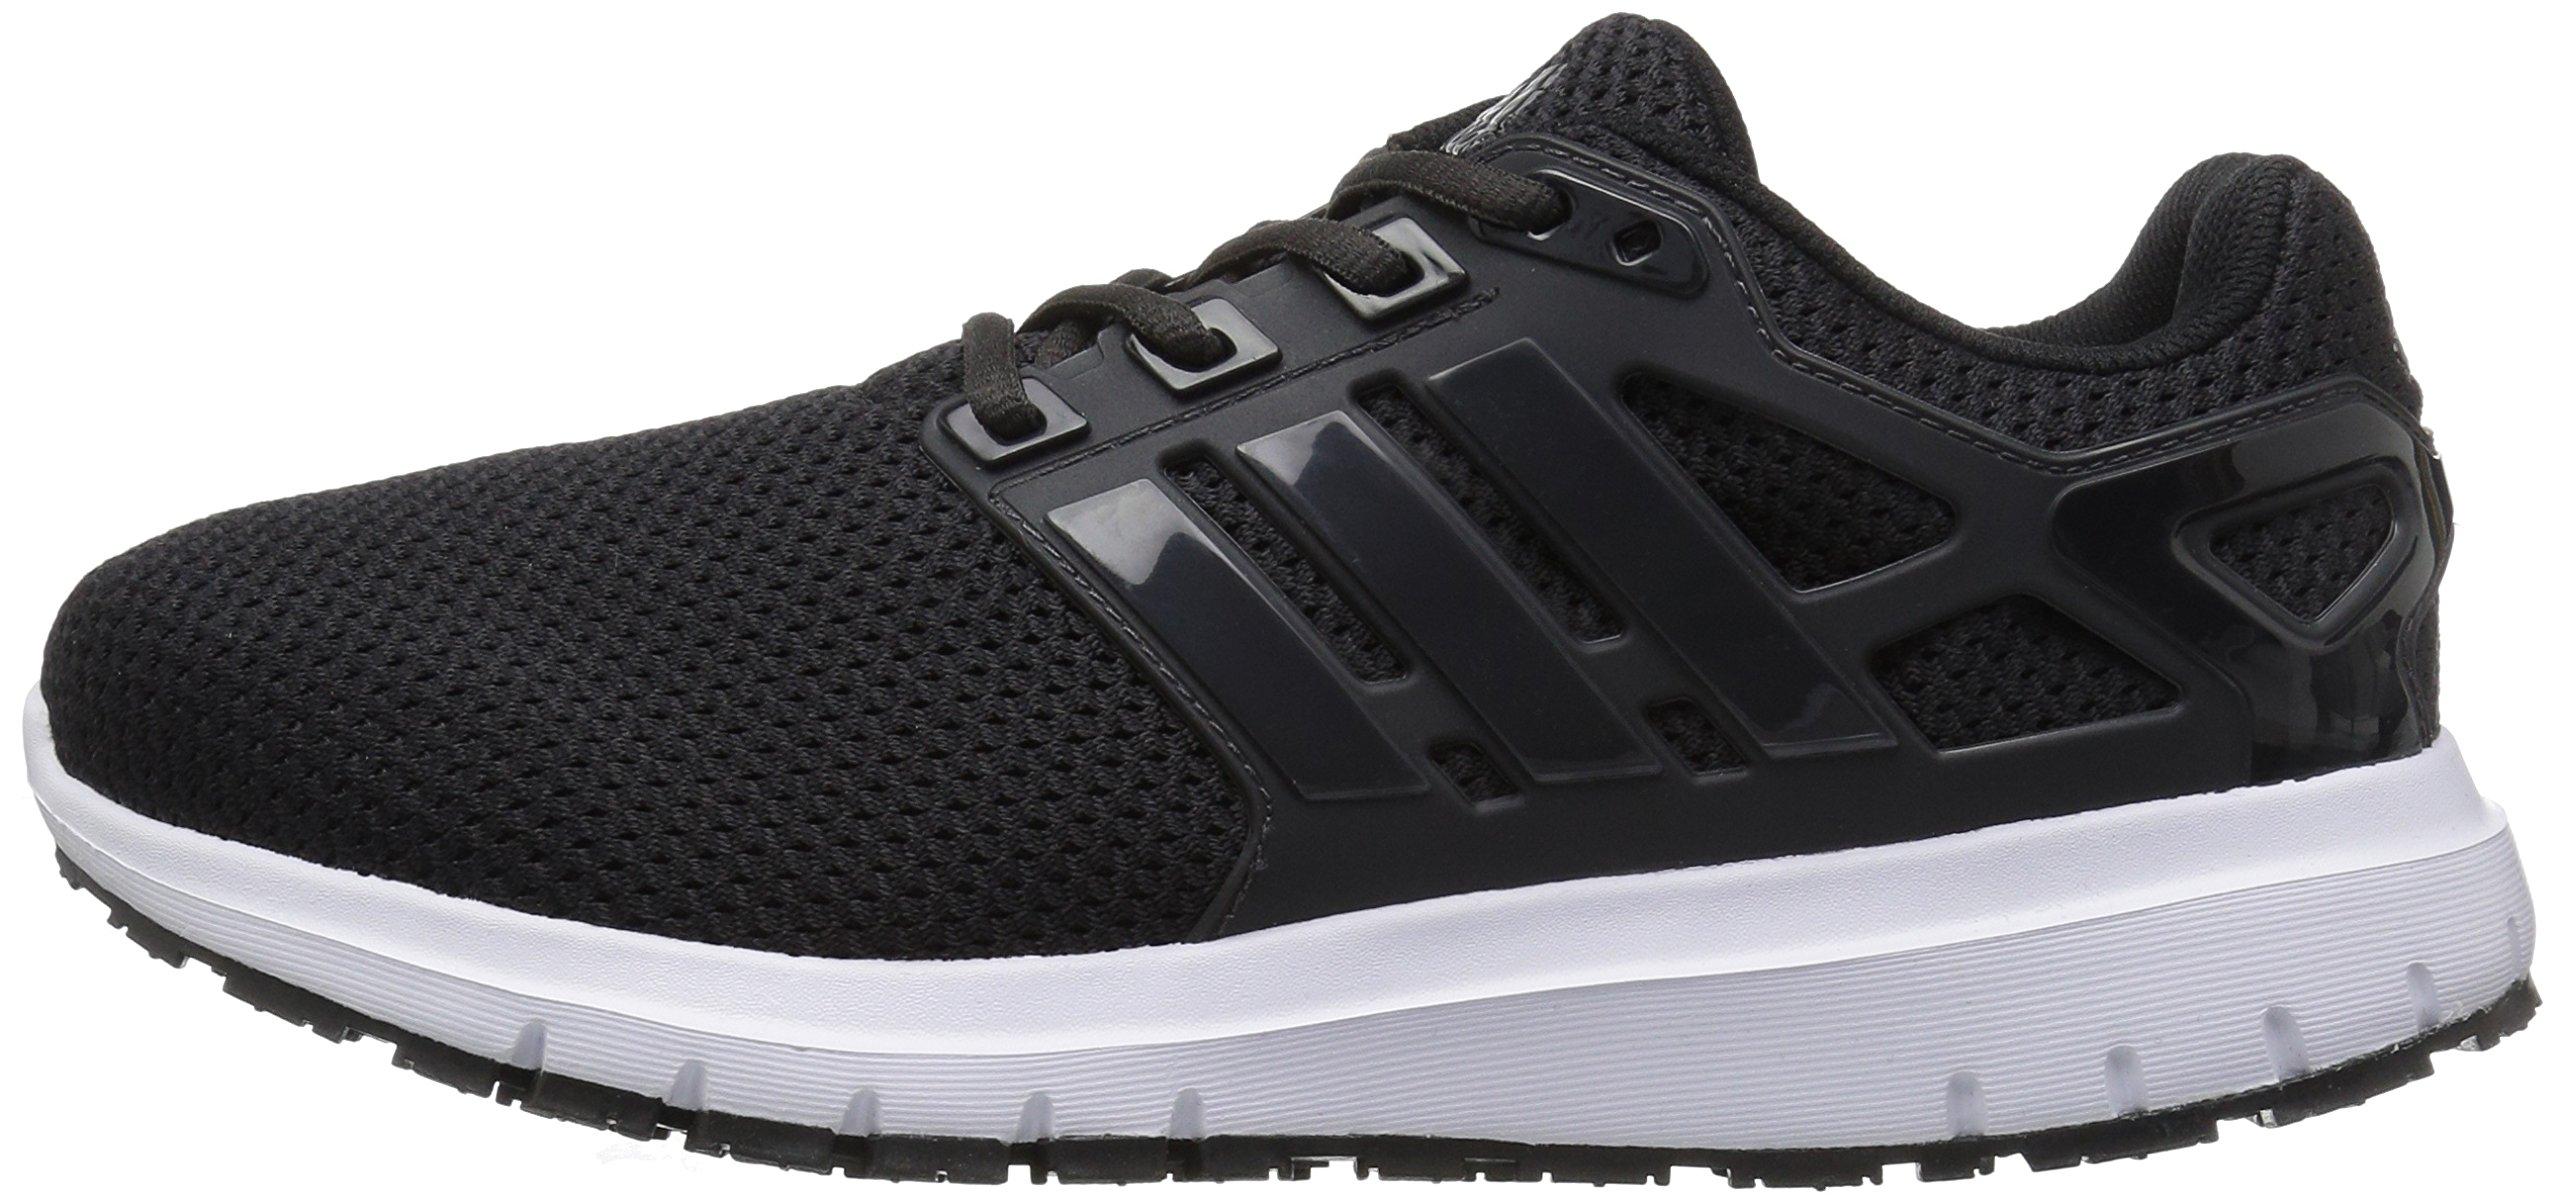 adidas  Men's Energy Cloud Wide m Running Shoe, BLACK/UTILITY BLACK/WHITE, 10.5 2E US by adidas (Image #5)